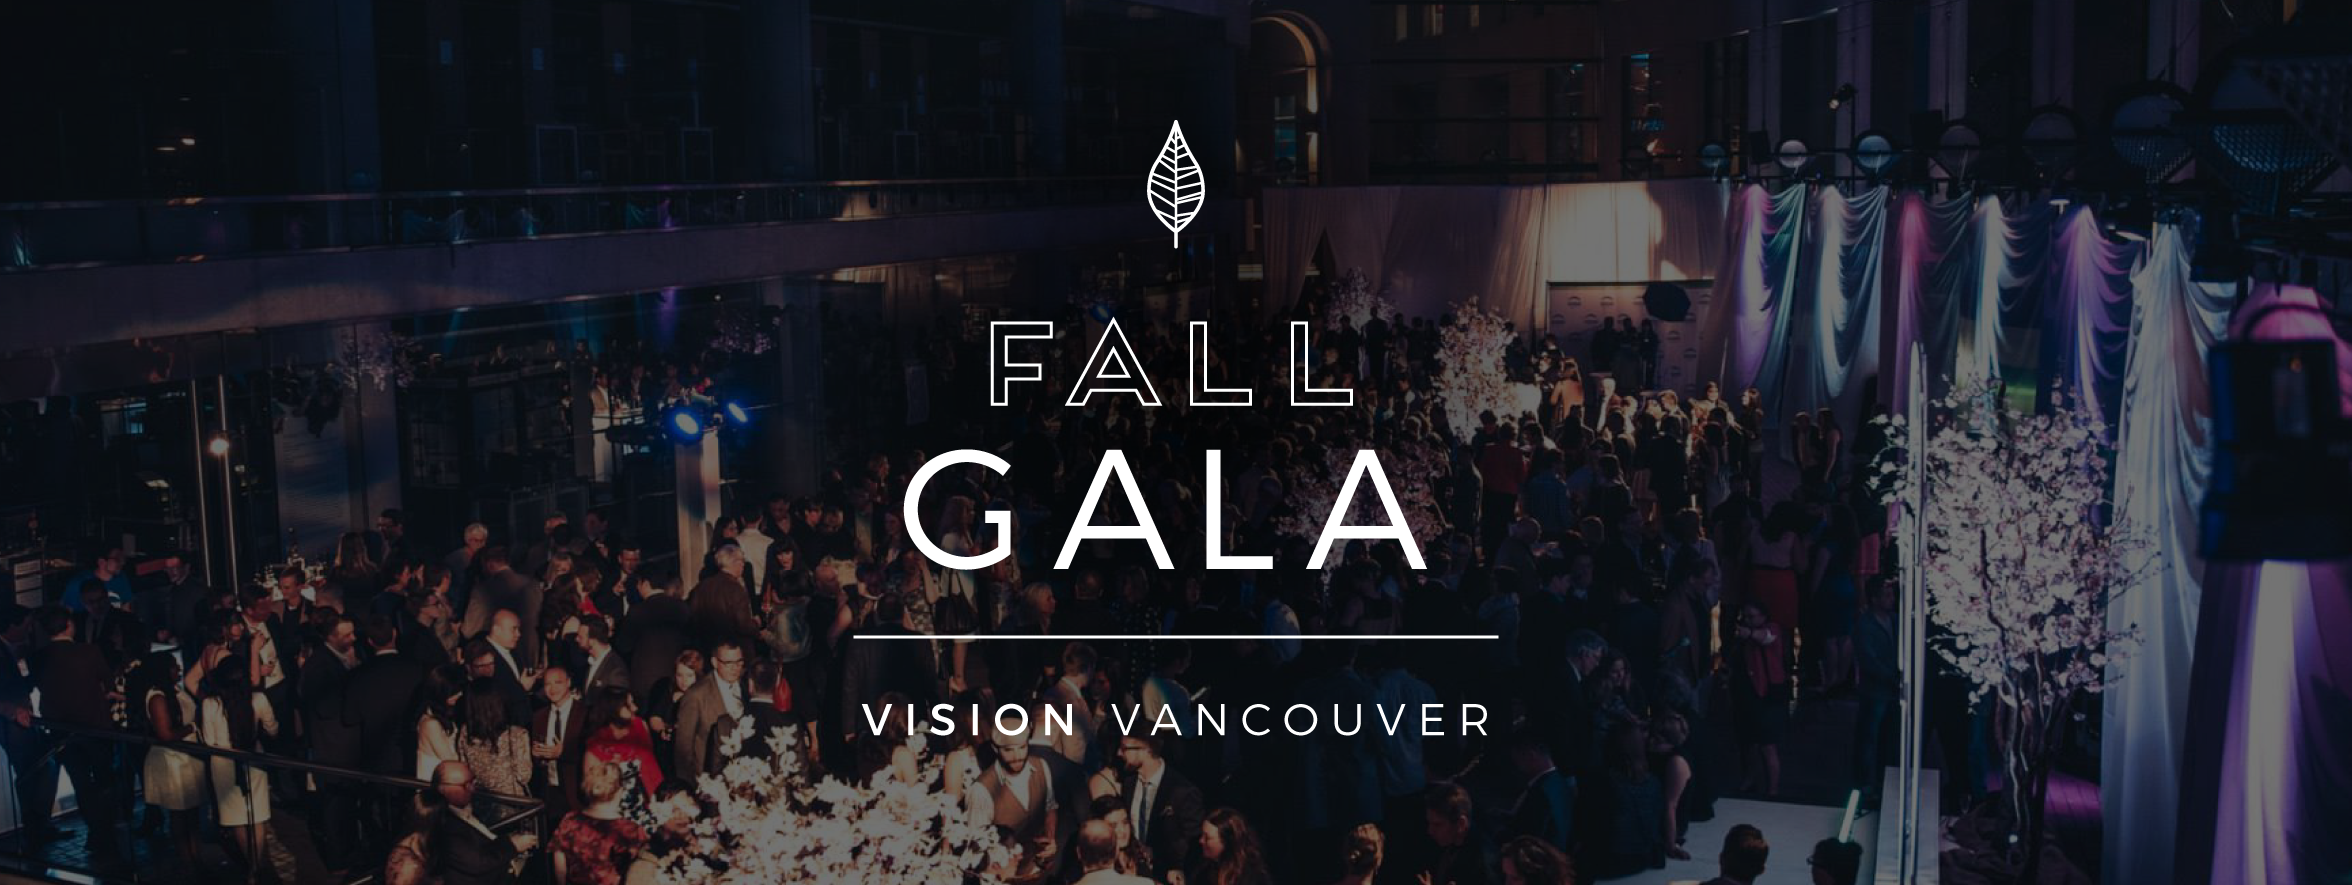 FallGala-FB-Event-Banner5.png